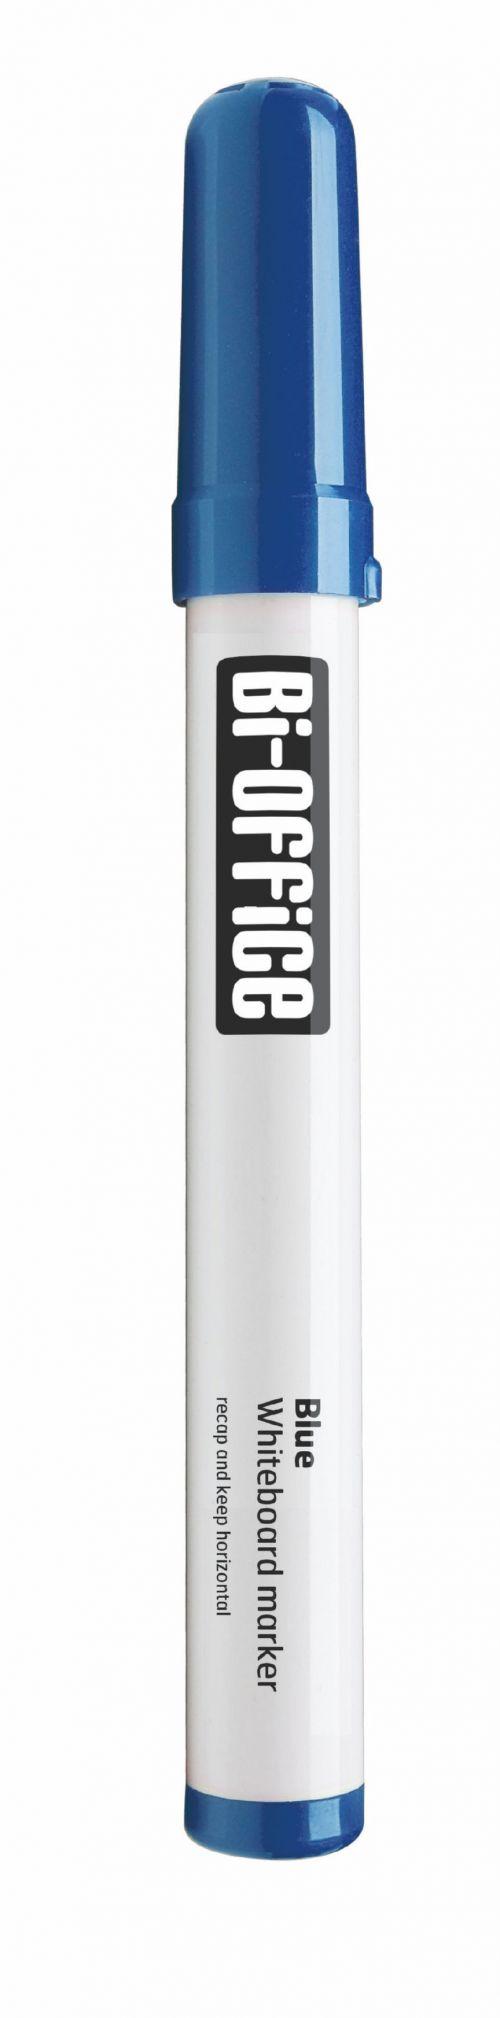 Bi-Office Dryerase Whiteboard Marker Bullet Tip Blue (Pack 10)